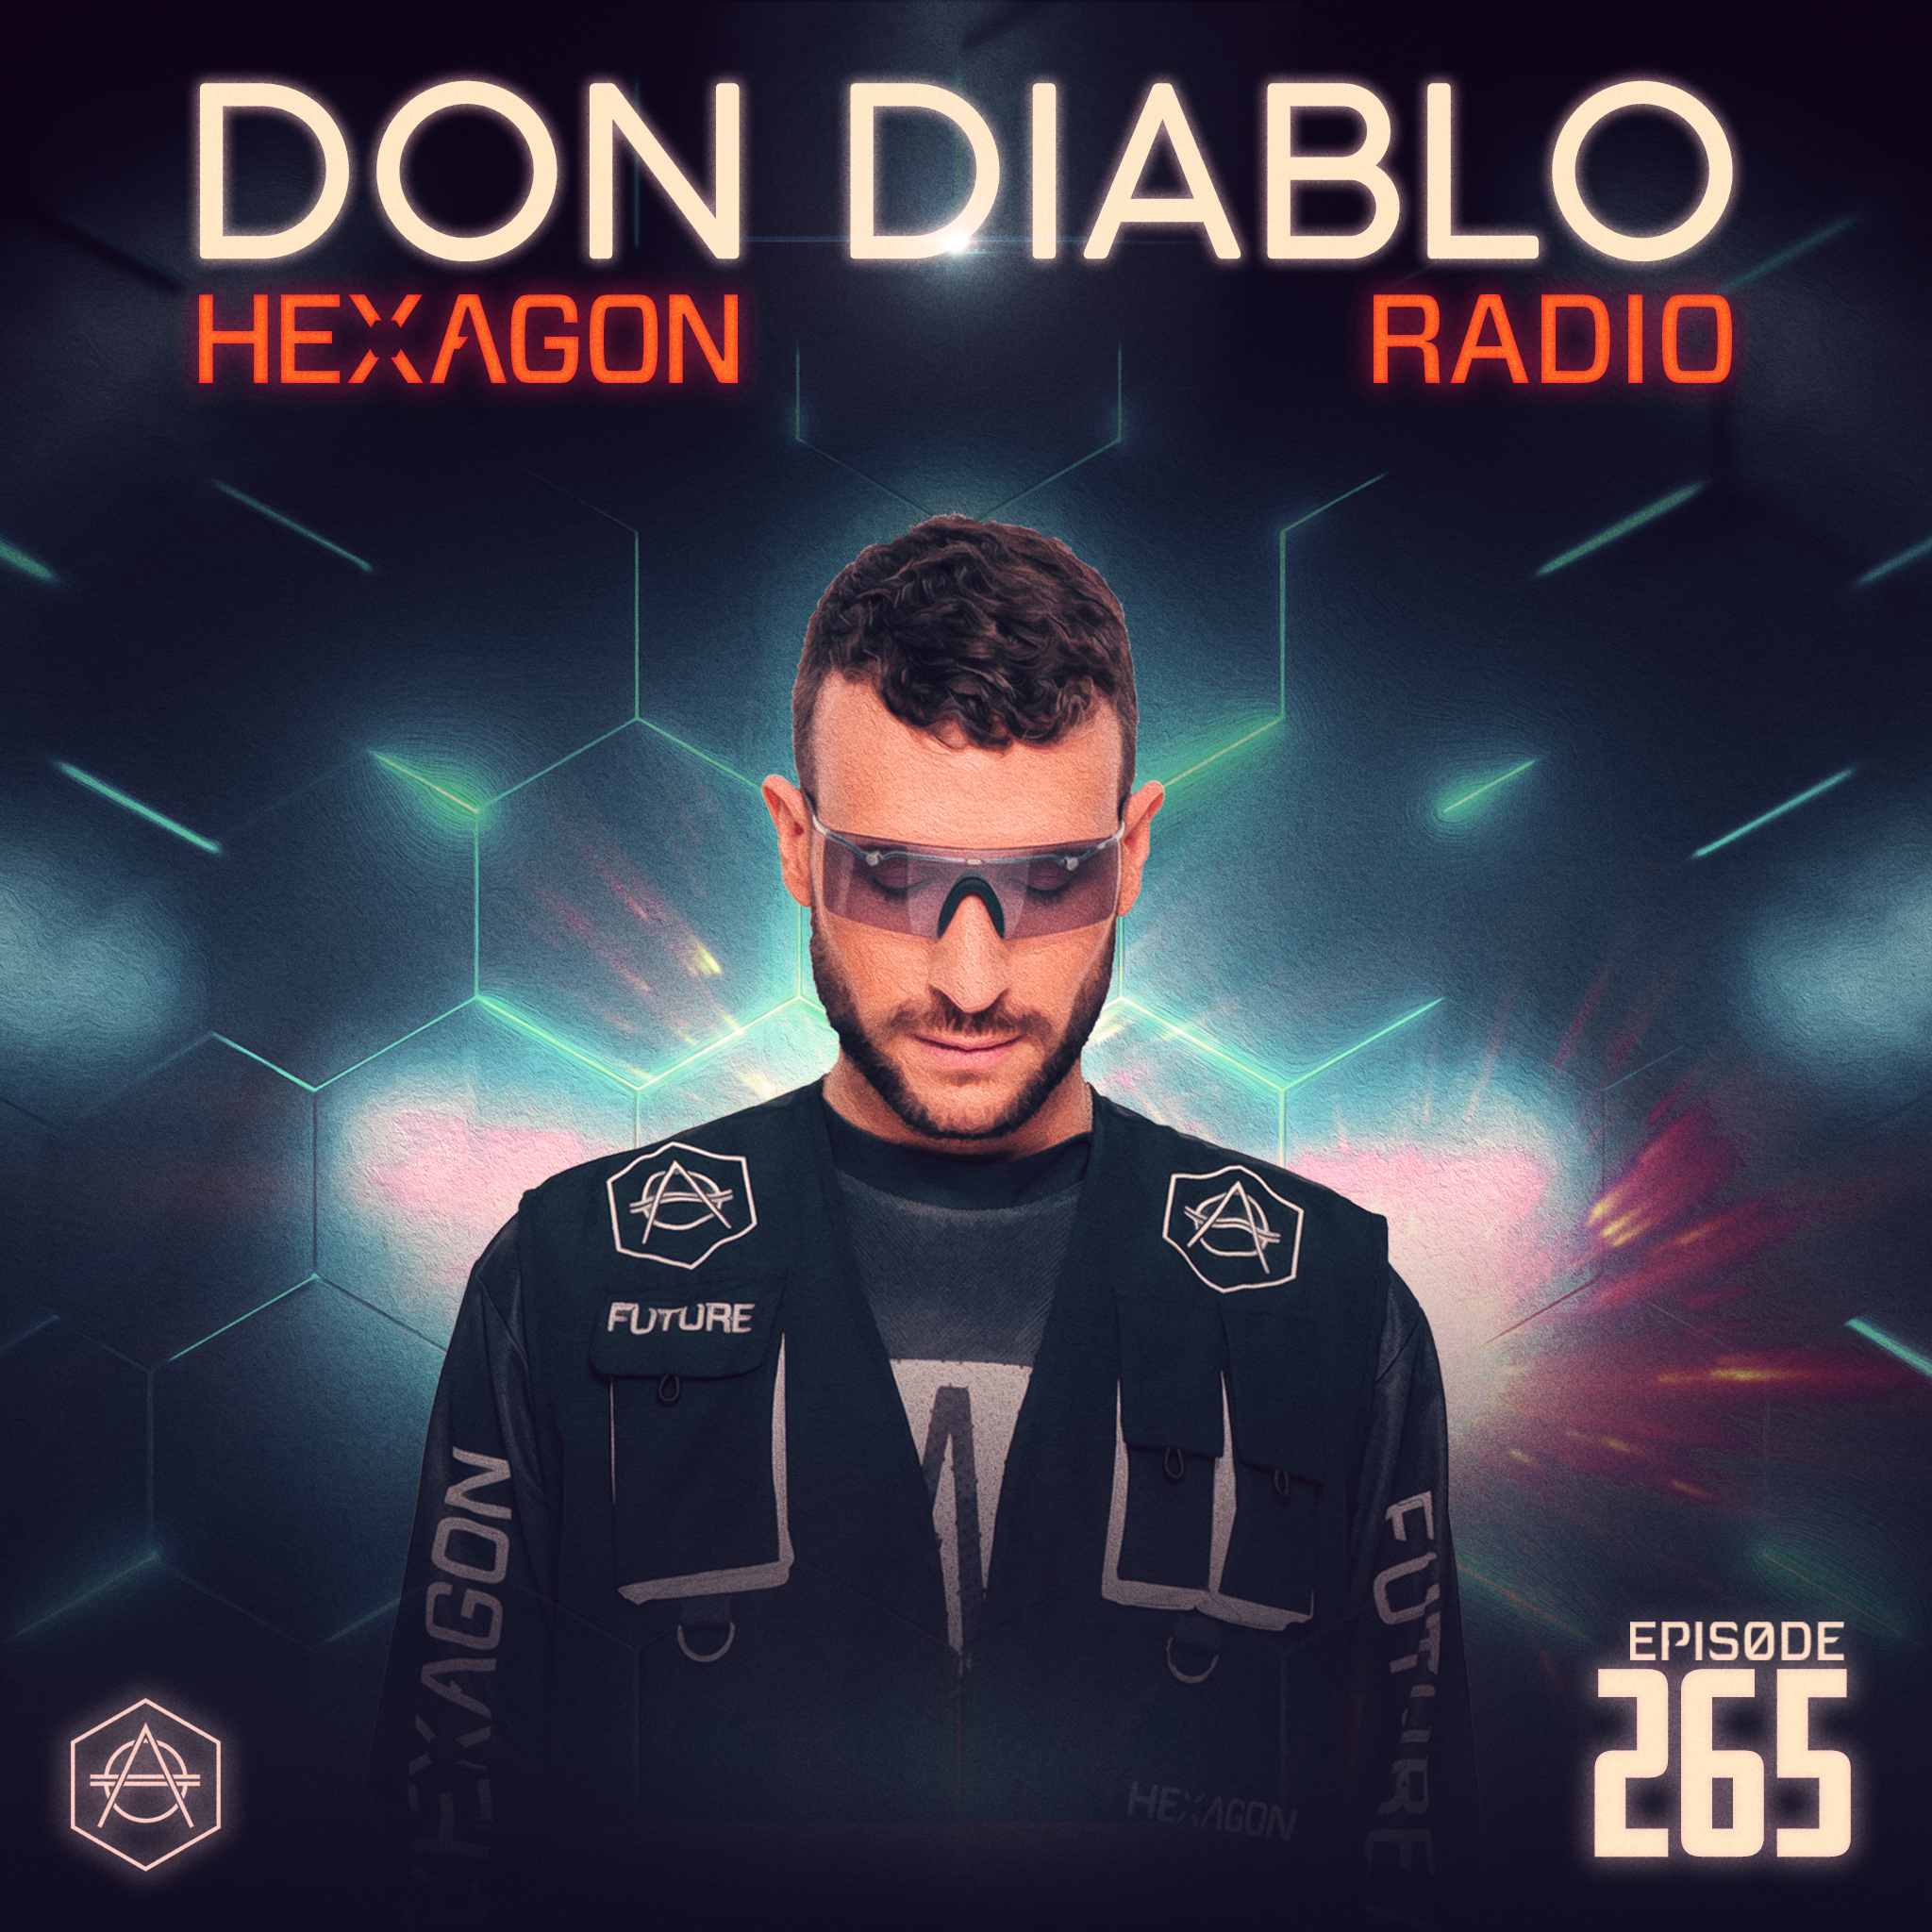 Don Diablo Hexagon Radio Episode 265